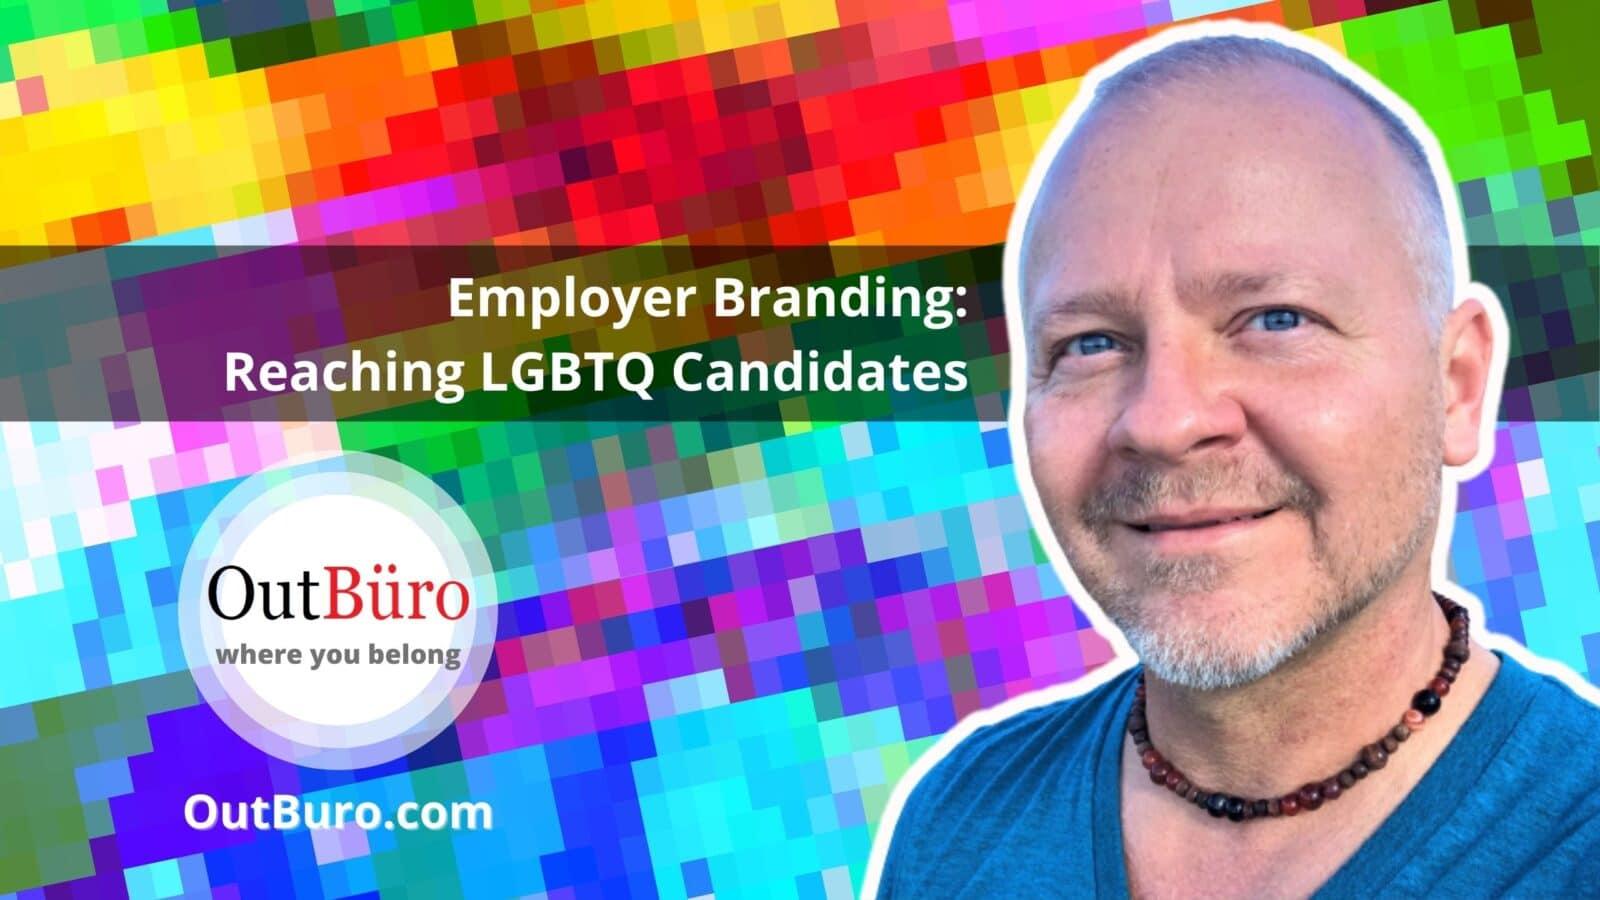 Employer Branding: Reaching LGBTQ Candidates